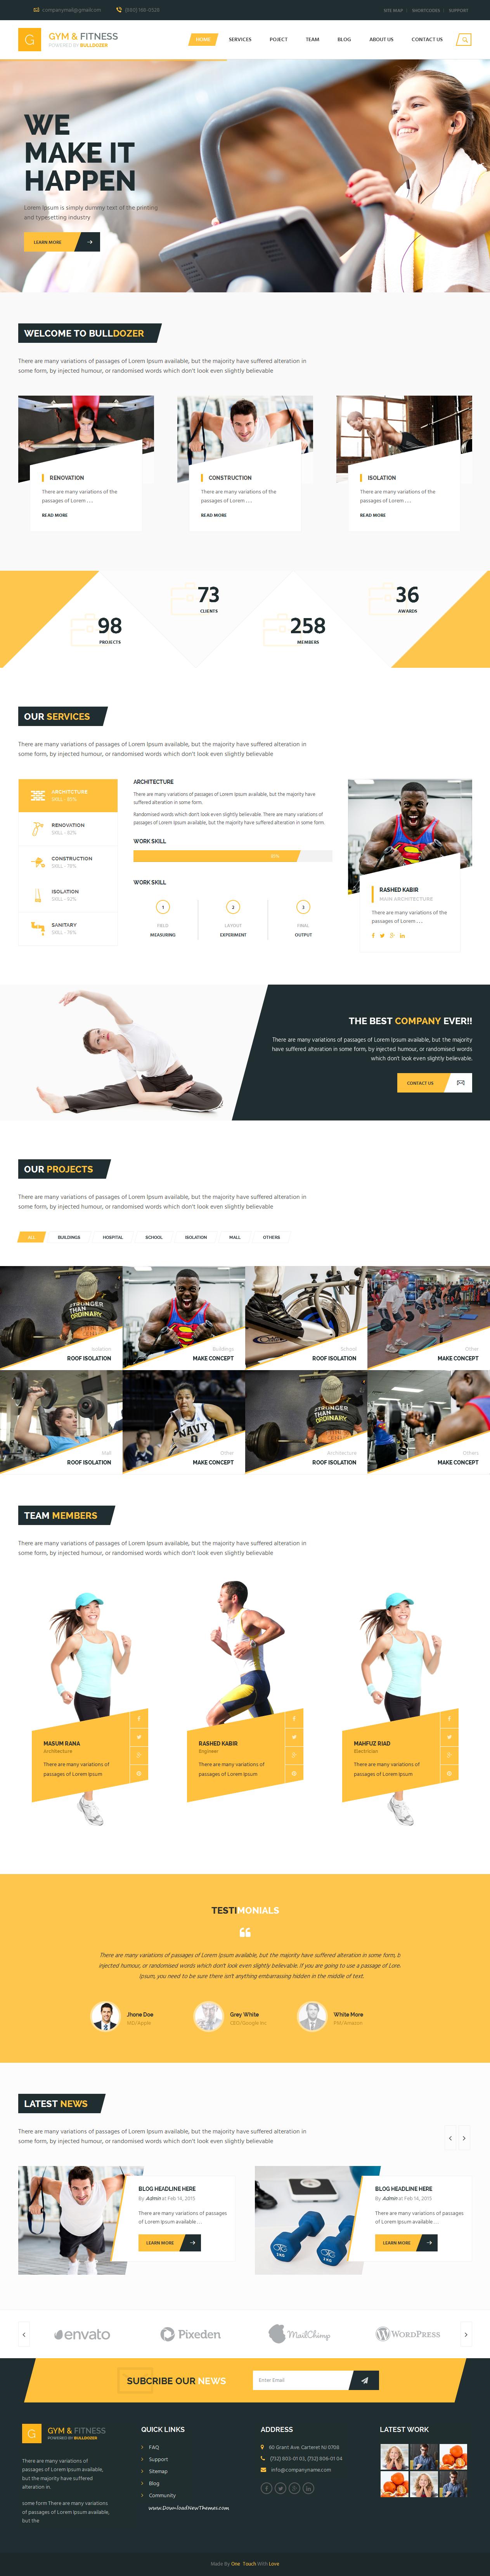 Bulldozer Is An Multipurpose Premium Bootstrap Niche Template Gym Fitness Healthcare Webdesign Niche Template Web Design Bootstrap Template